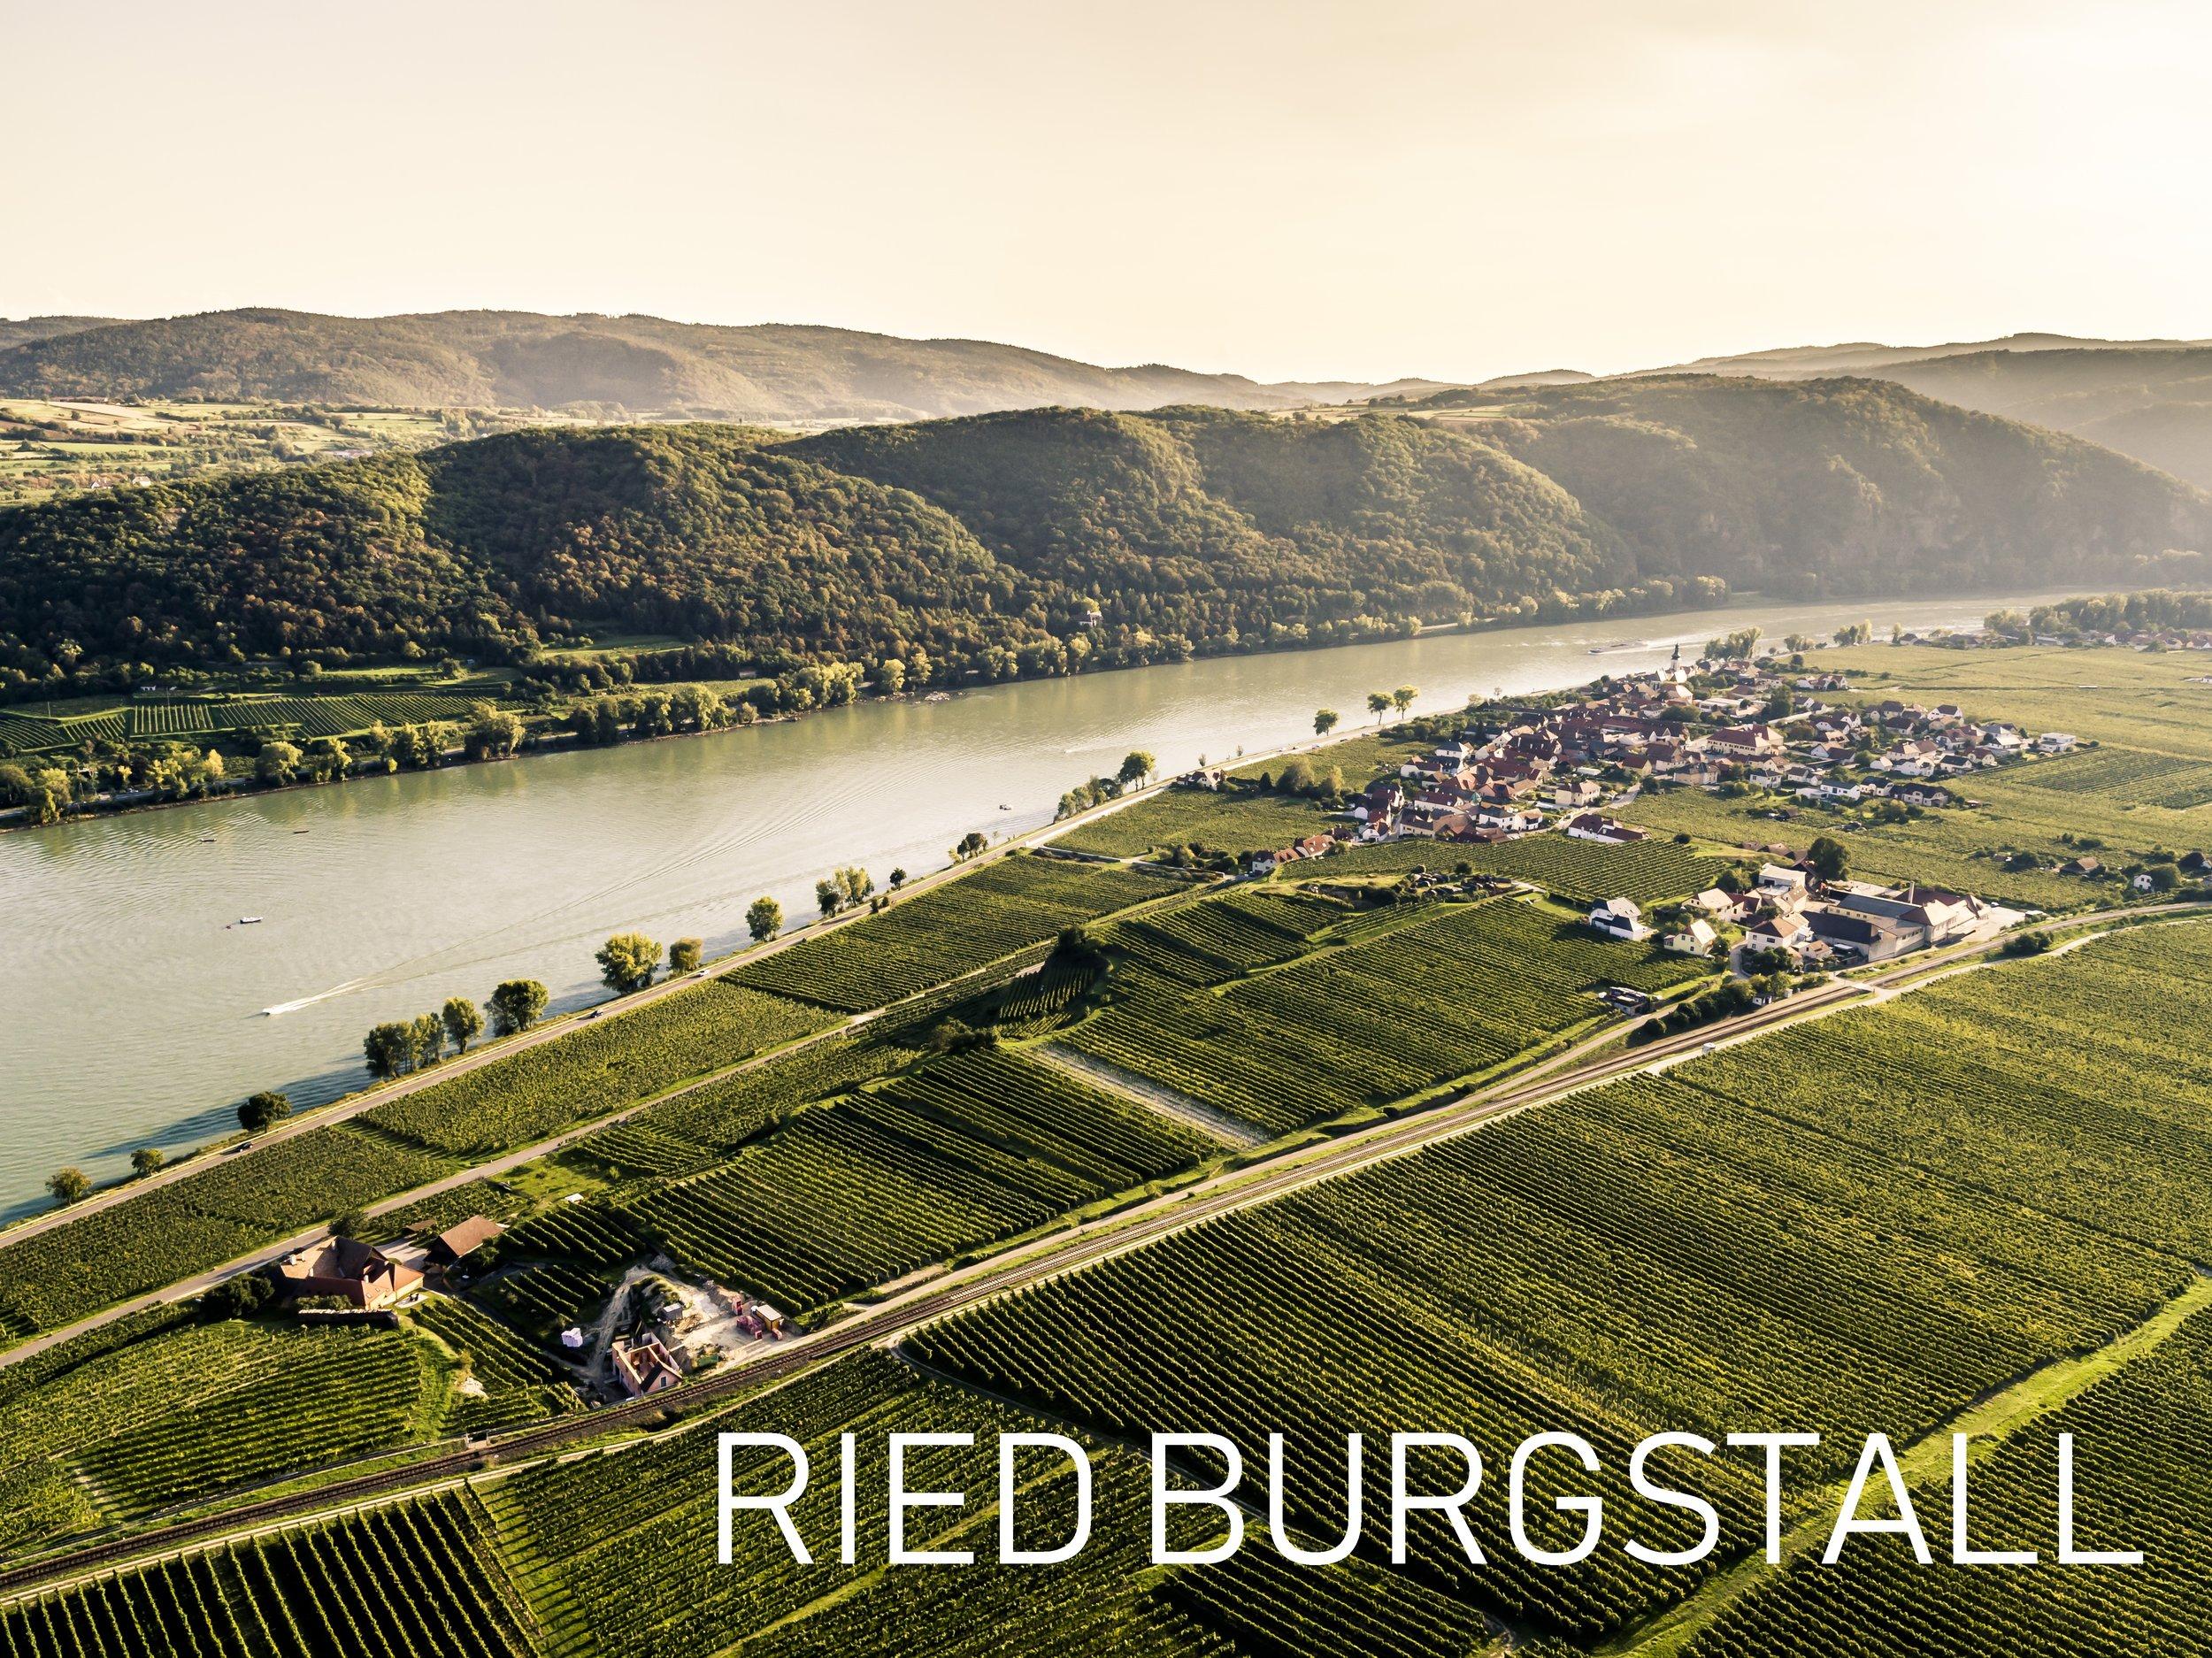 Herbst_Ried_Burgstall.jpg